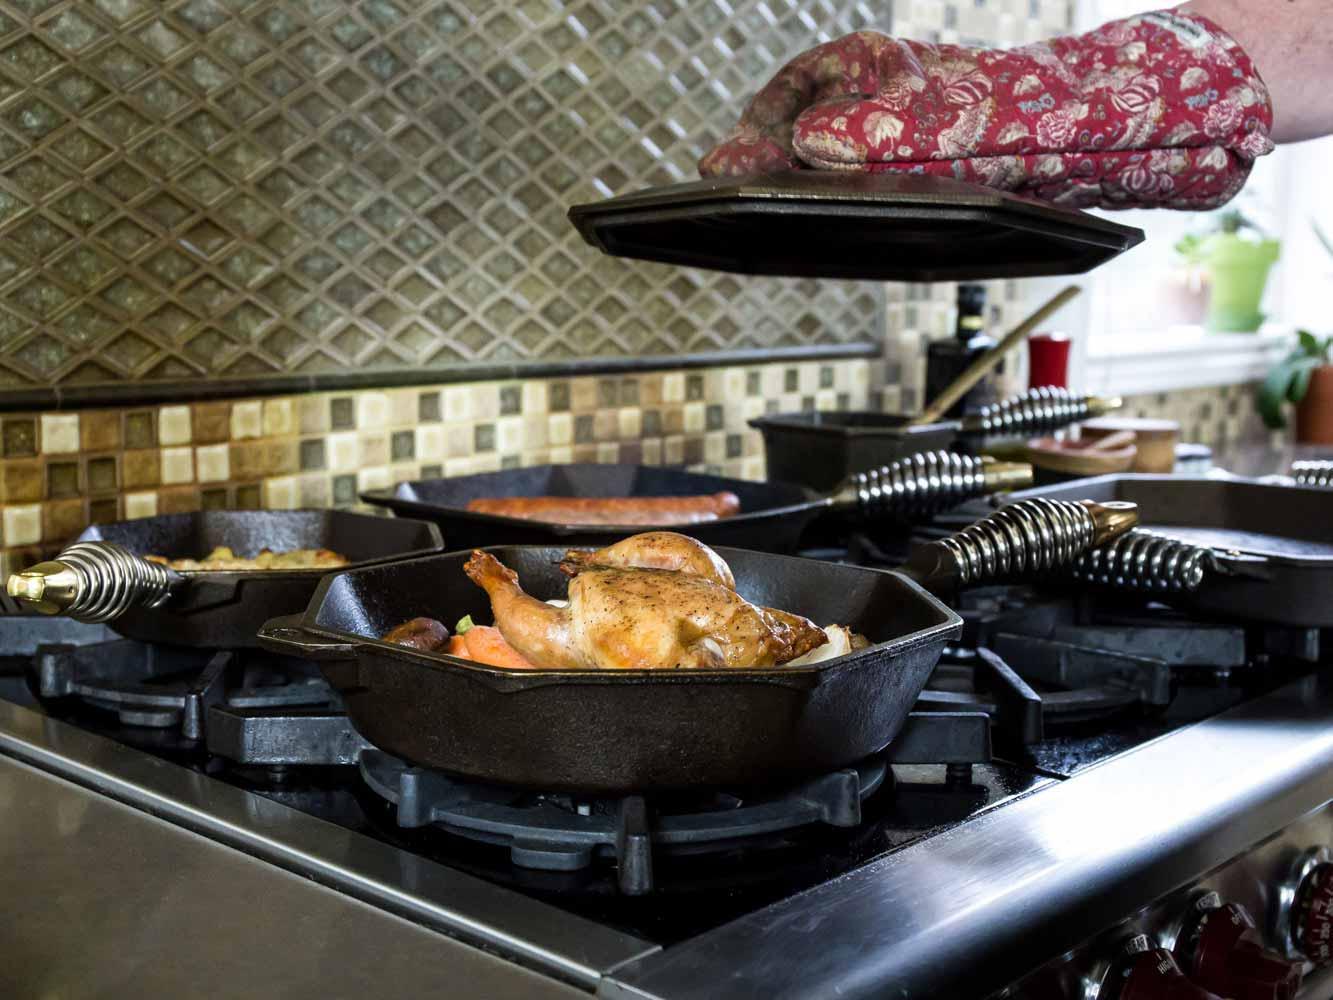 FINEX Cast Iron Cookware Complete Cast Iron Set